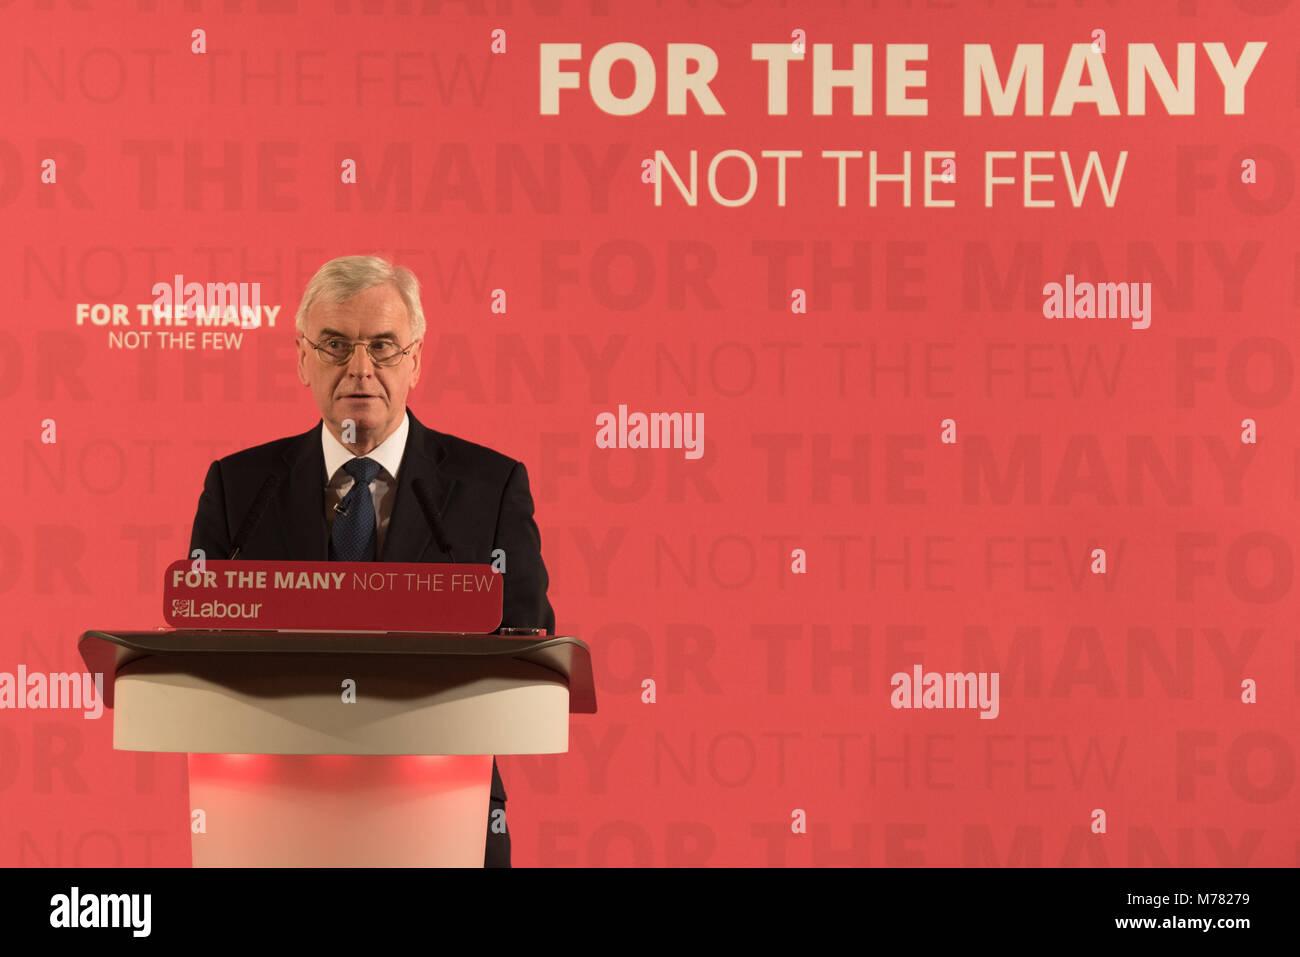 London, United Kingdom. 9 March 2018. John McDonnell MP, Labour's Shadow Chancellor, sets out Labour's demands for - Stock Image